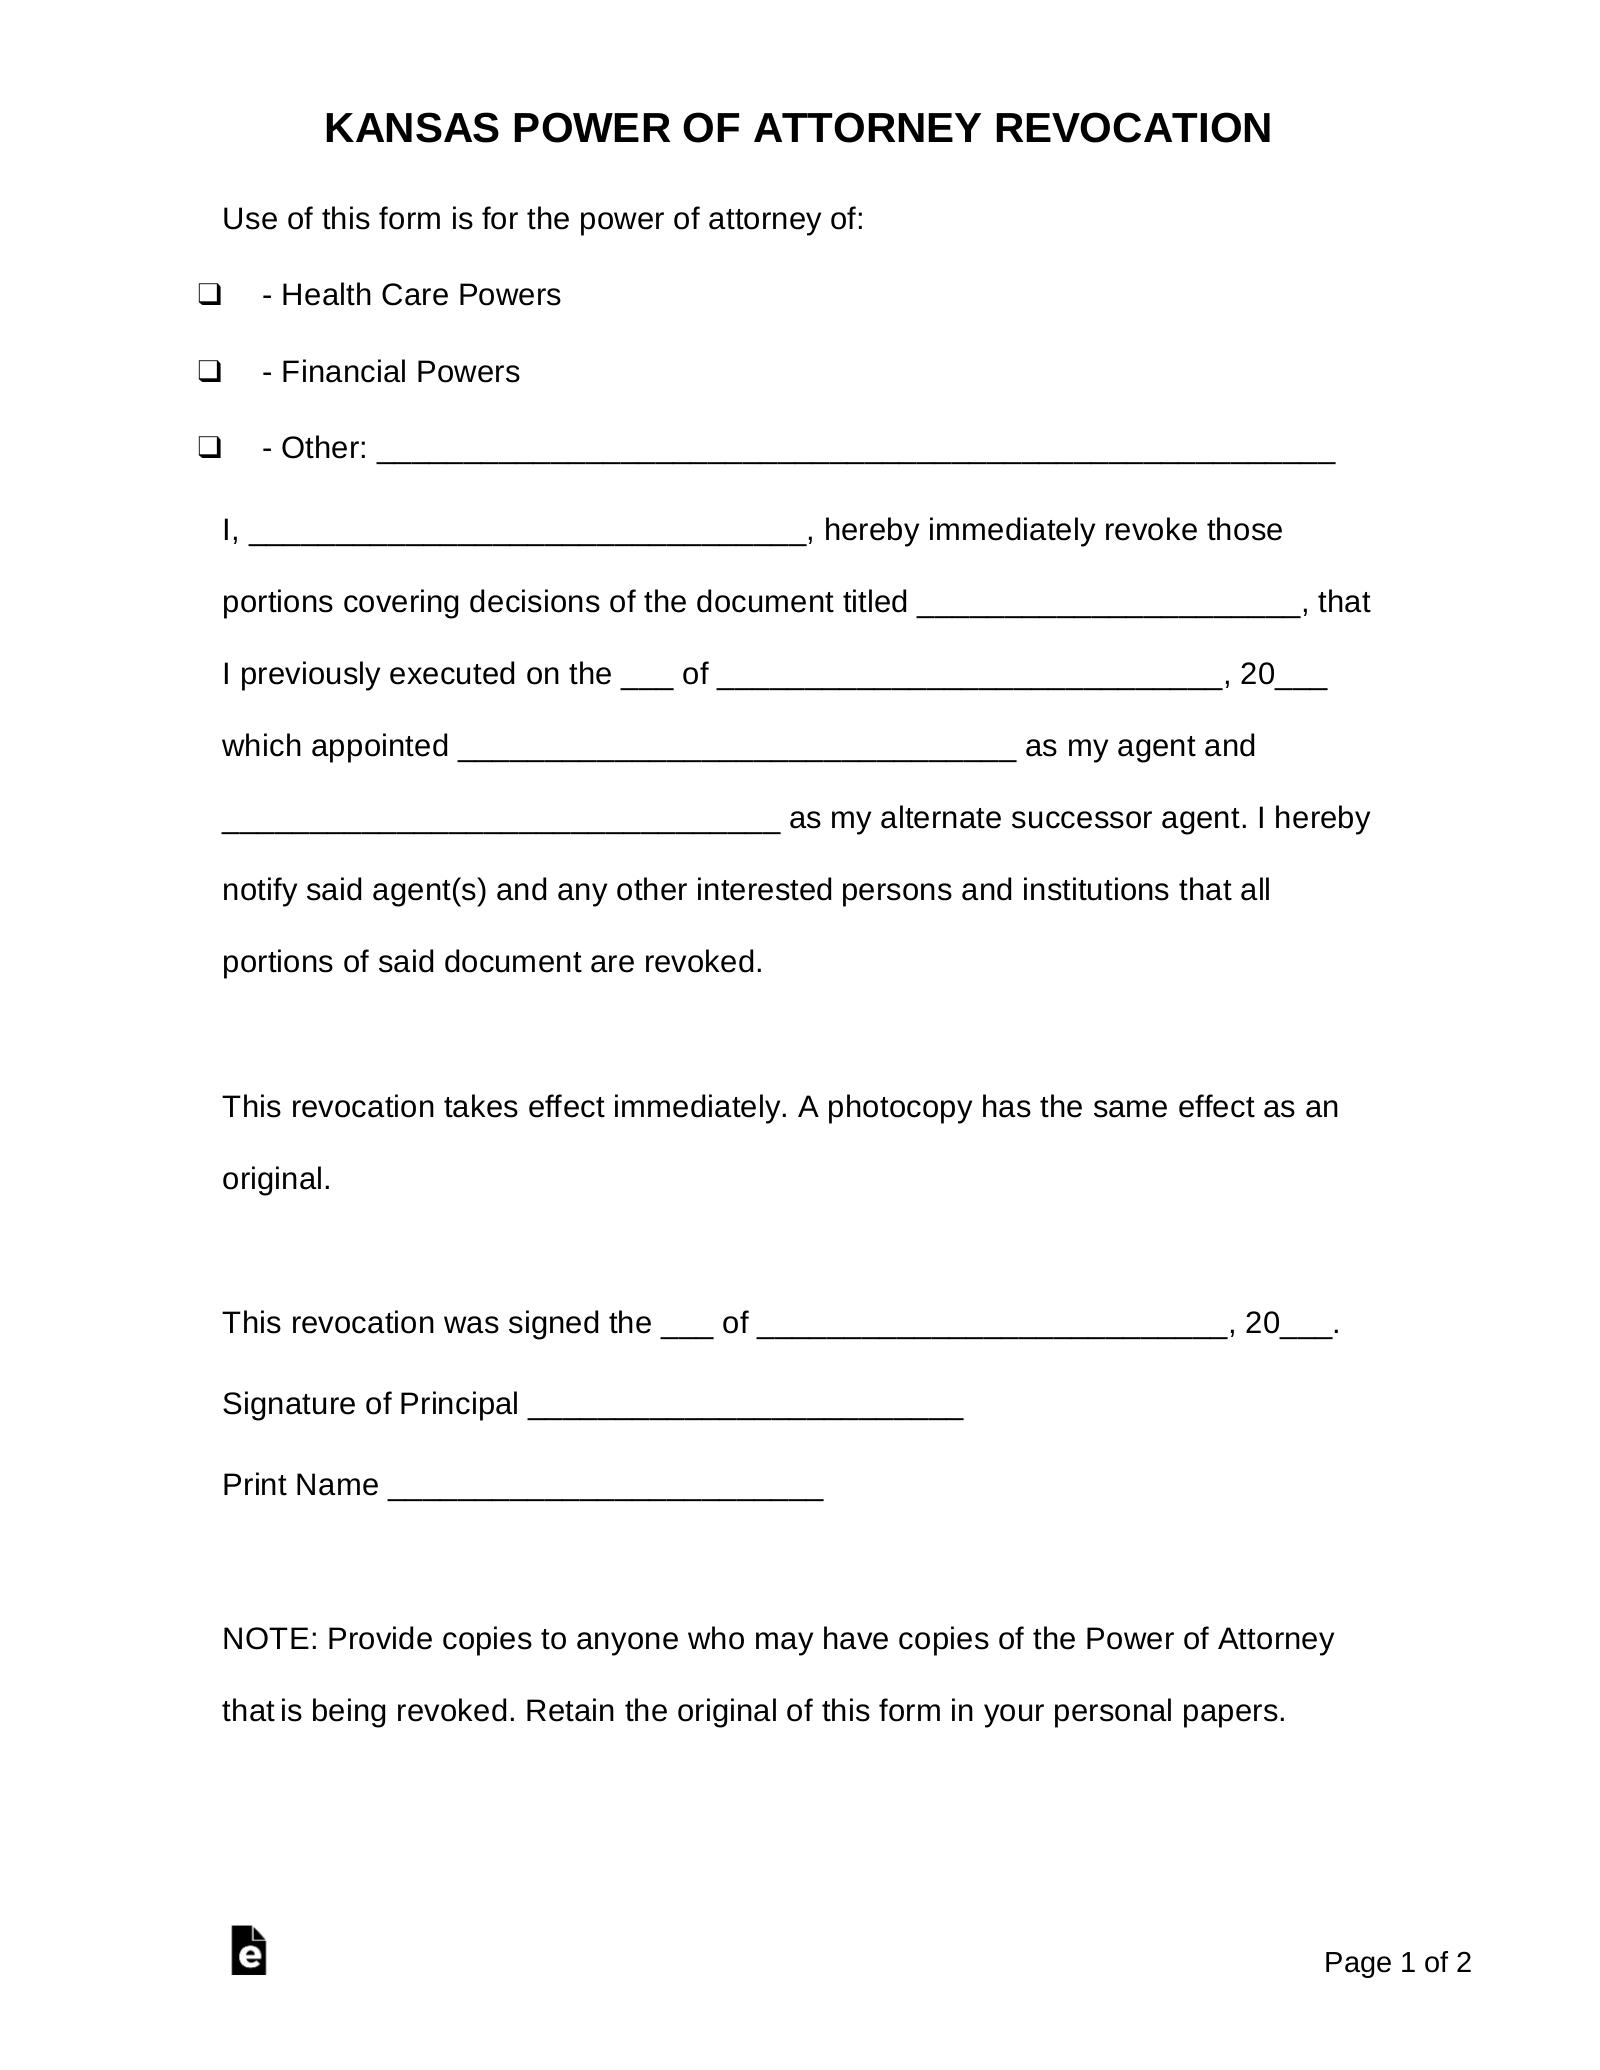 Free Kansas Power Of Attorney Revocation Form PDF Word